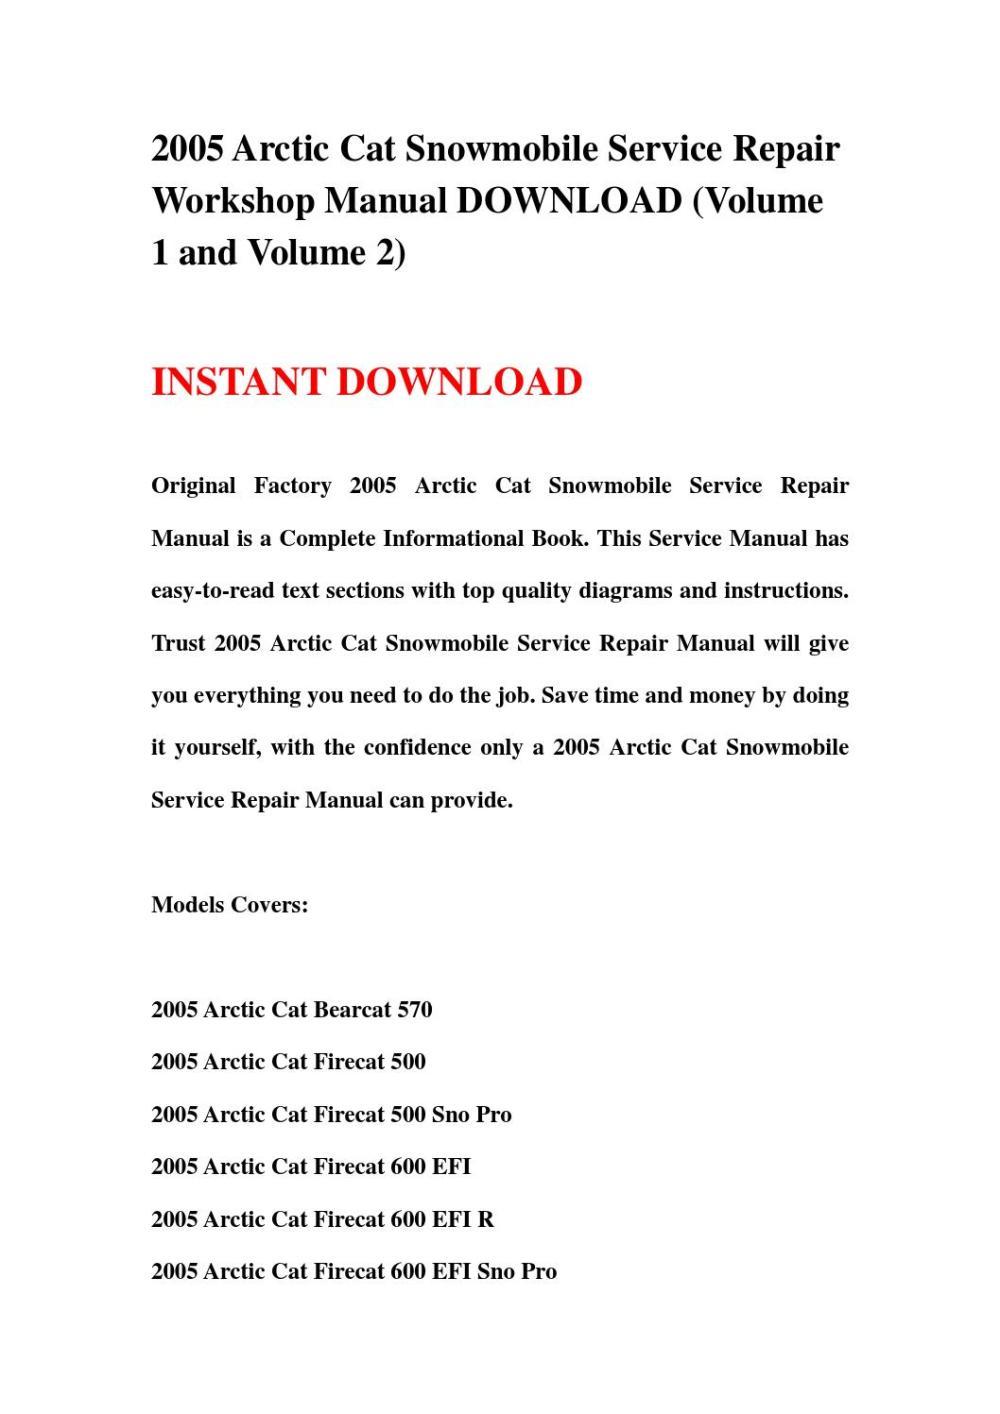 medium resolution of 2005 arctic cat snowmobile service repair workshop manual download volume 1 and volume 2